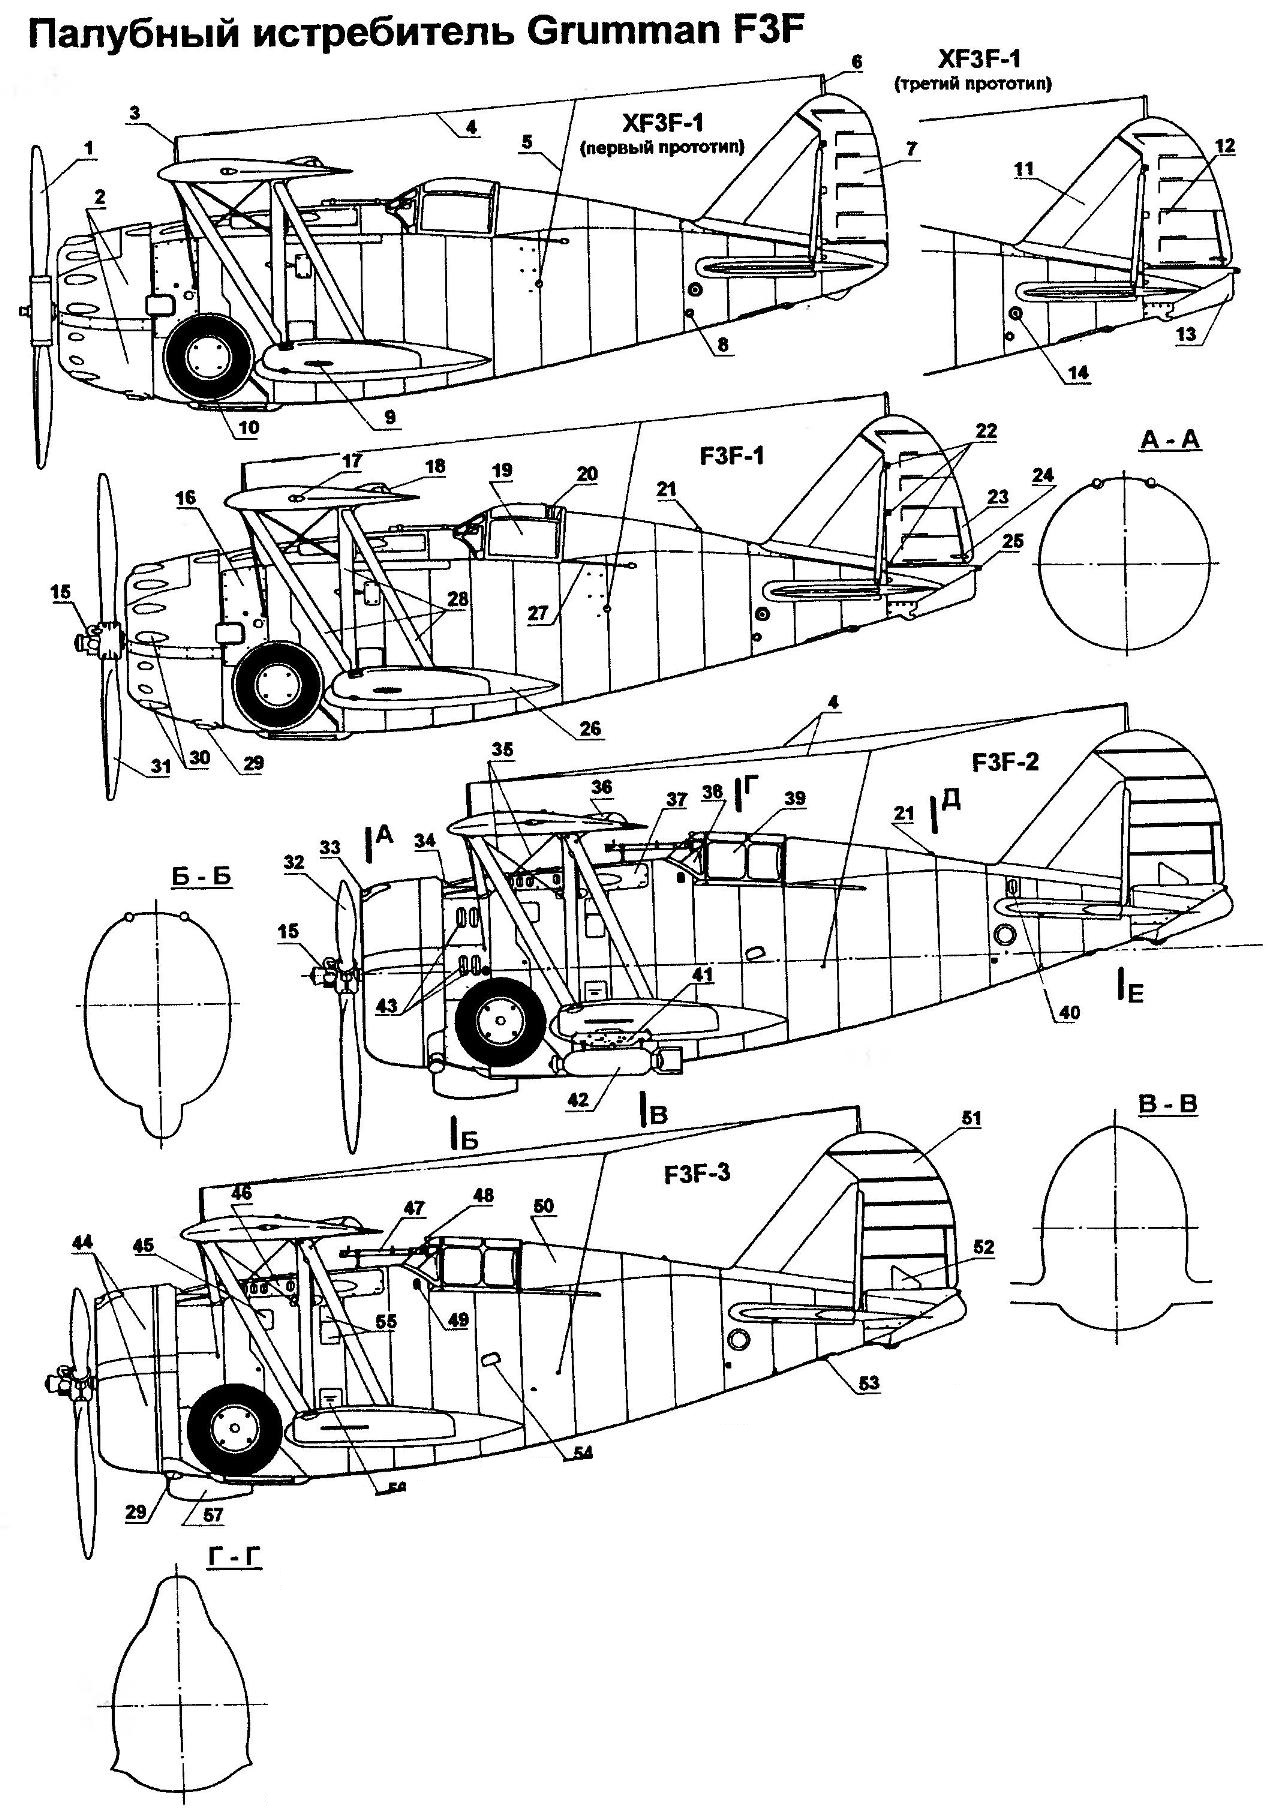 Carrier-based fighter Grumman F3F